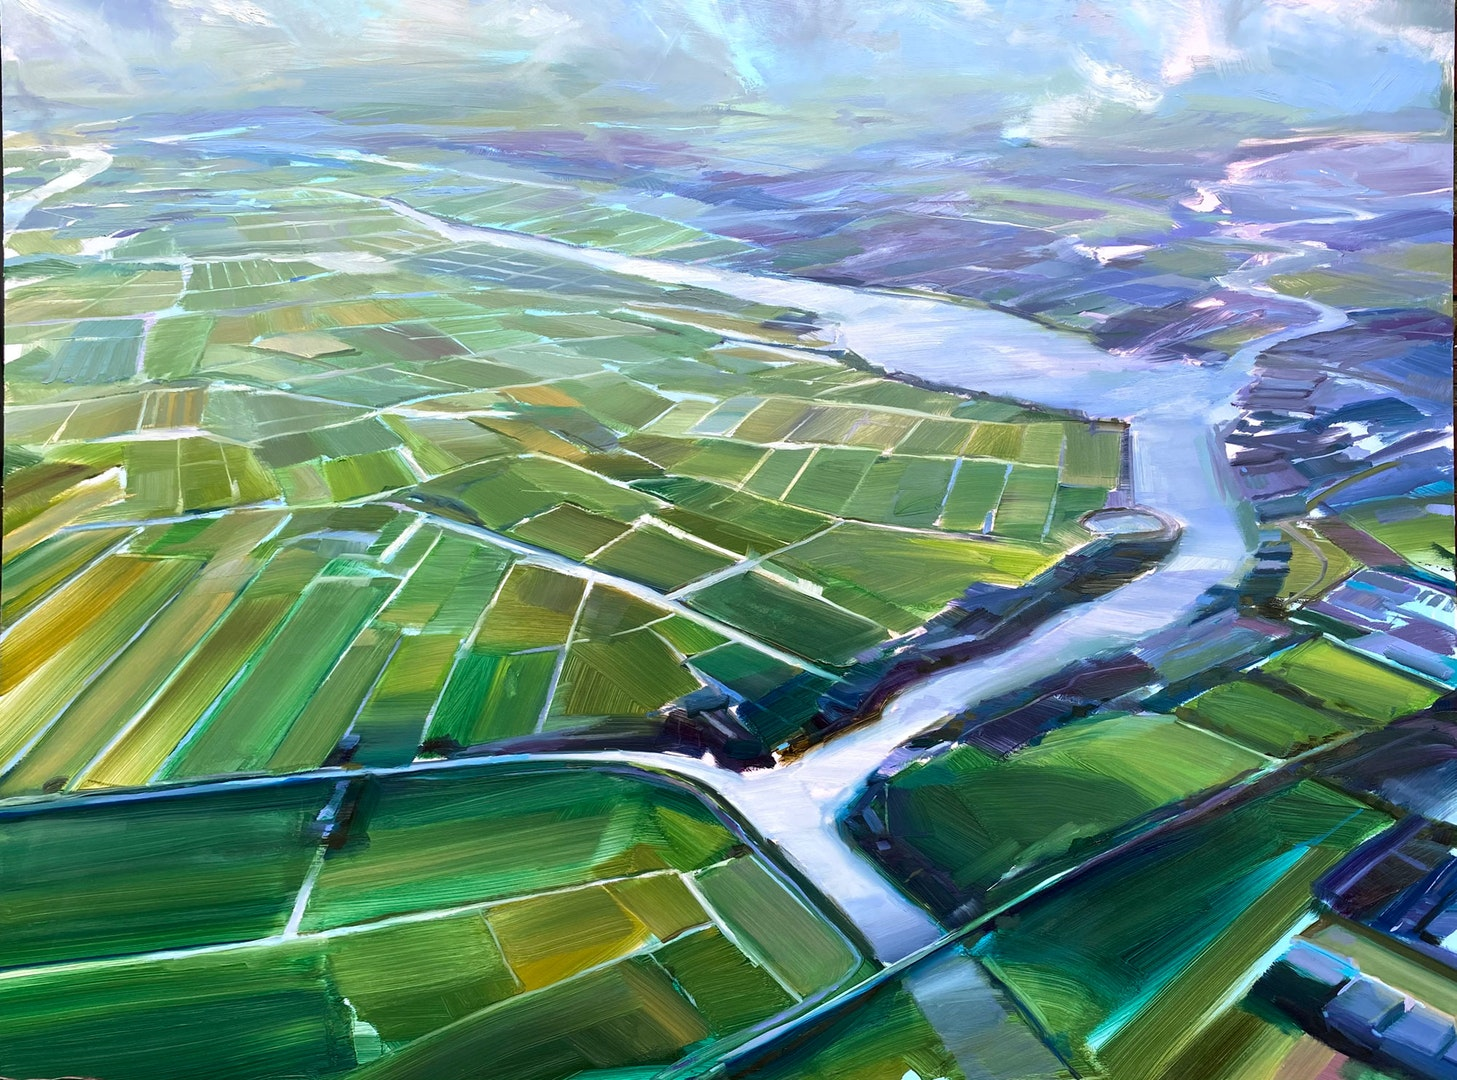 'Spaardam Landscape', Jonathan Hargreaves, Oil on panel, 90 x 122 cm